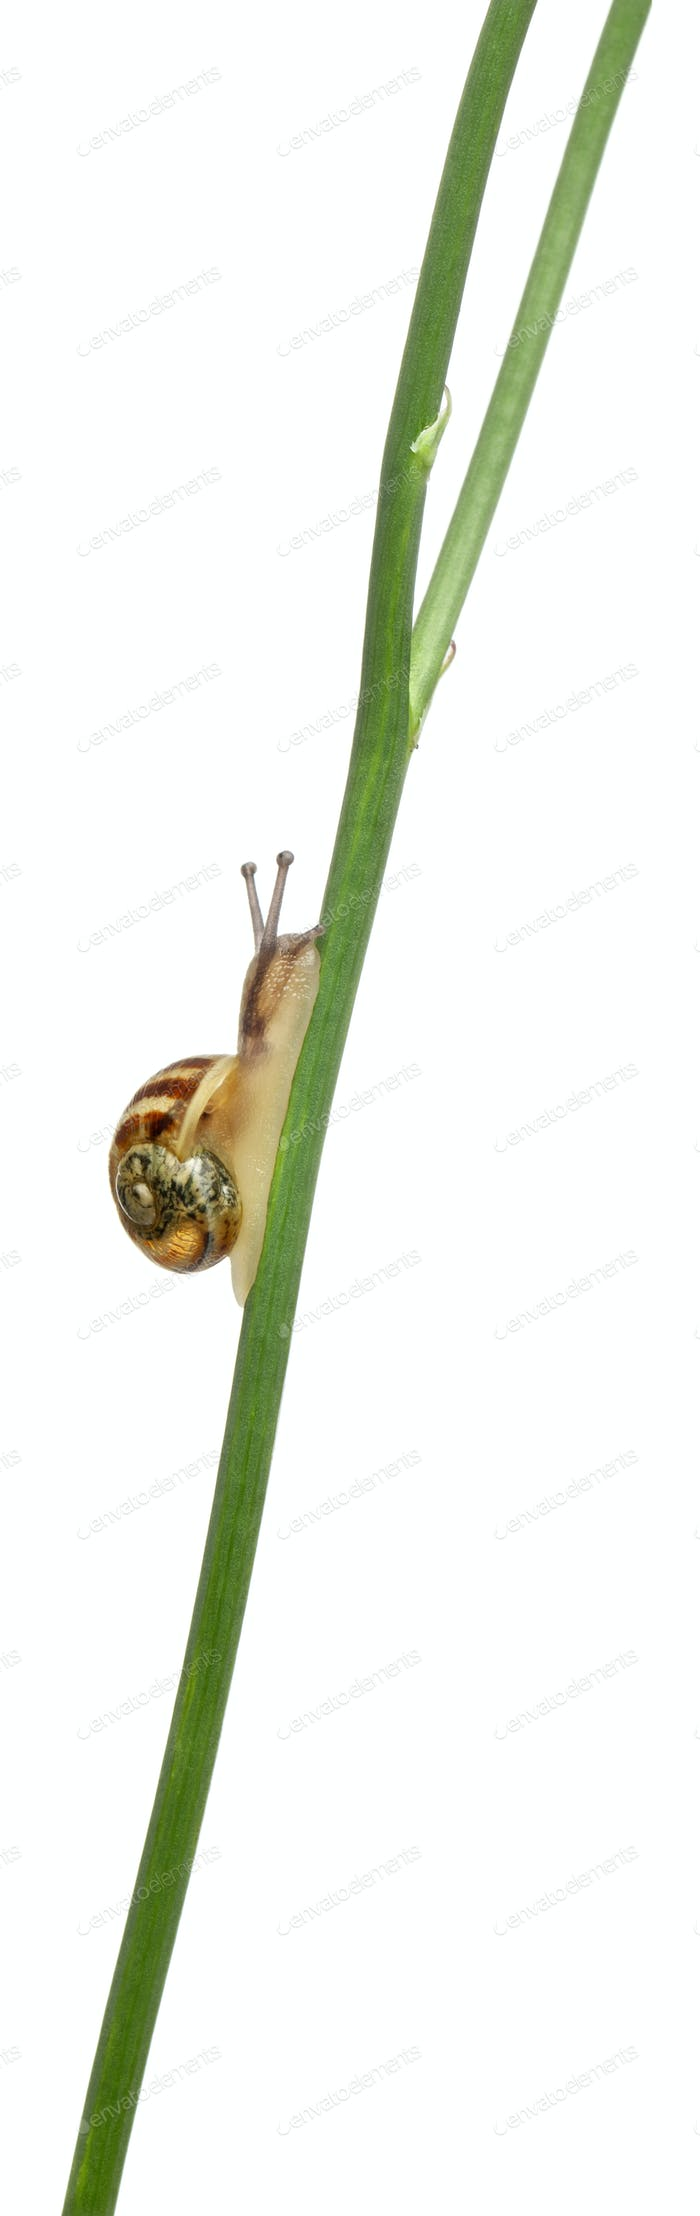 Garden snail, Helix aspersa, climbing stem in front of white background